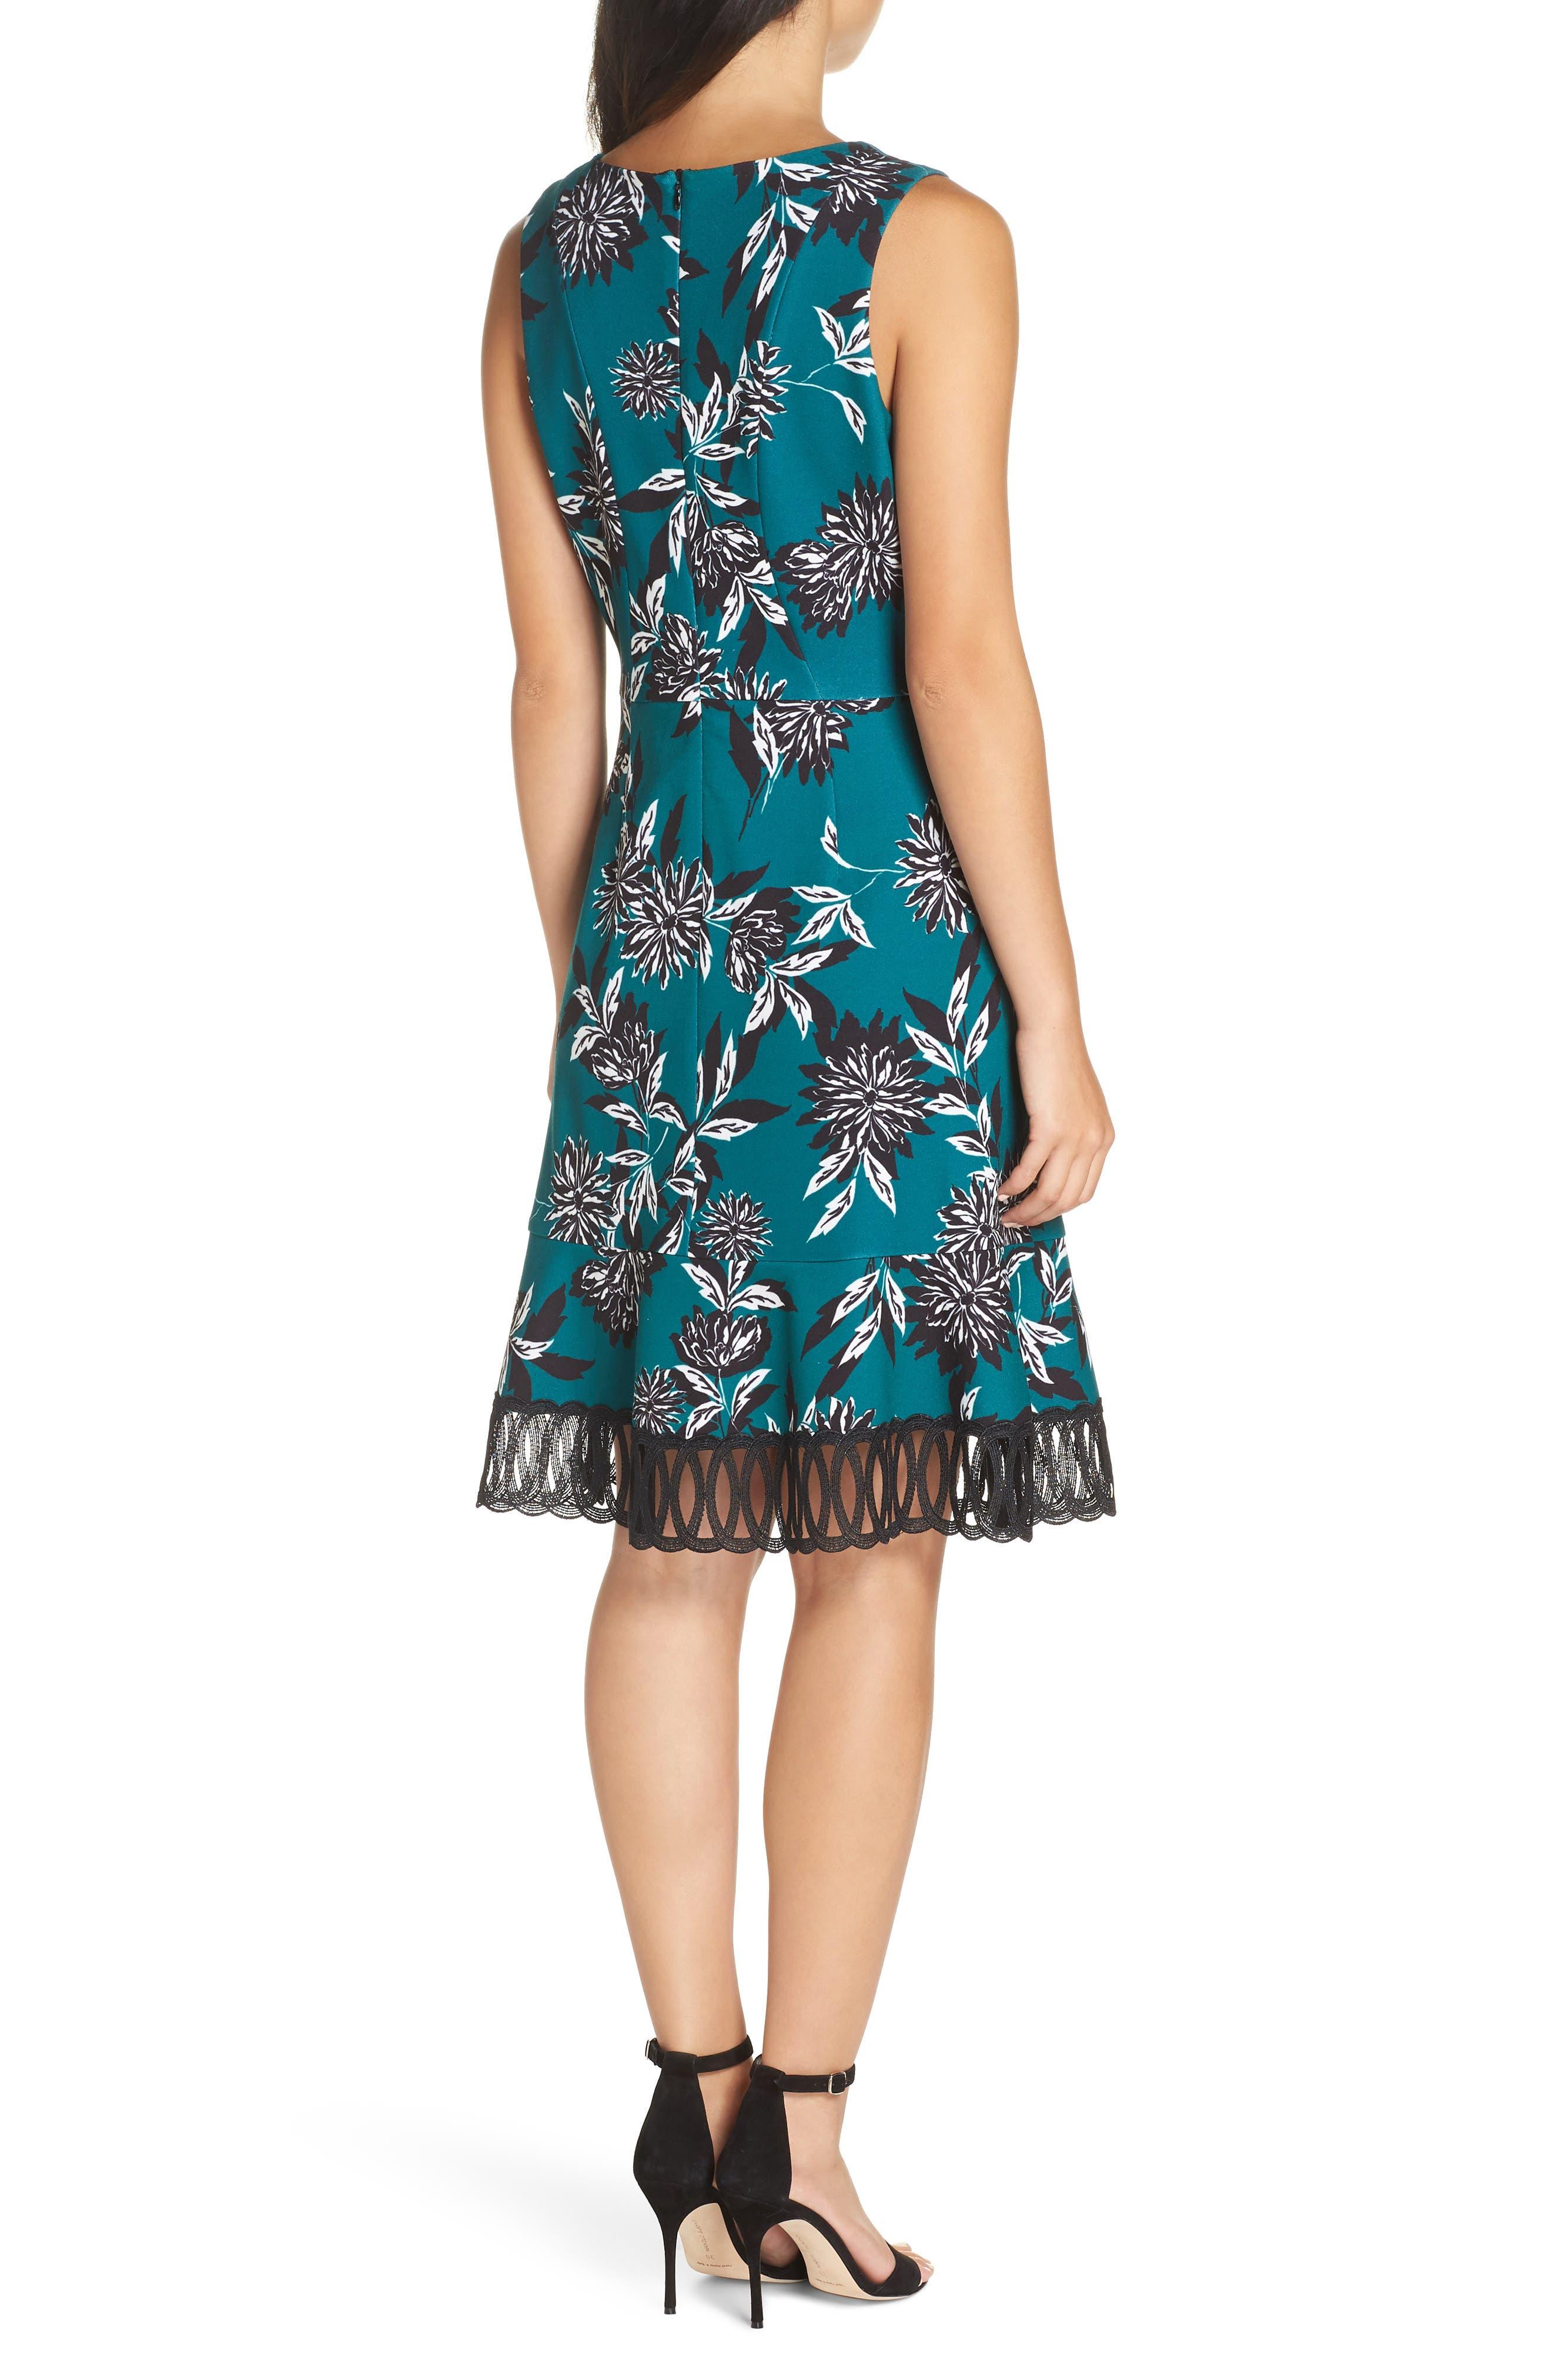 JULIA JORDAN, Crepe Scuba A-Line Dress, Alternate thumbnail 2, color, 300